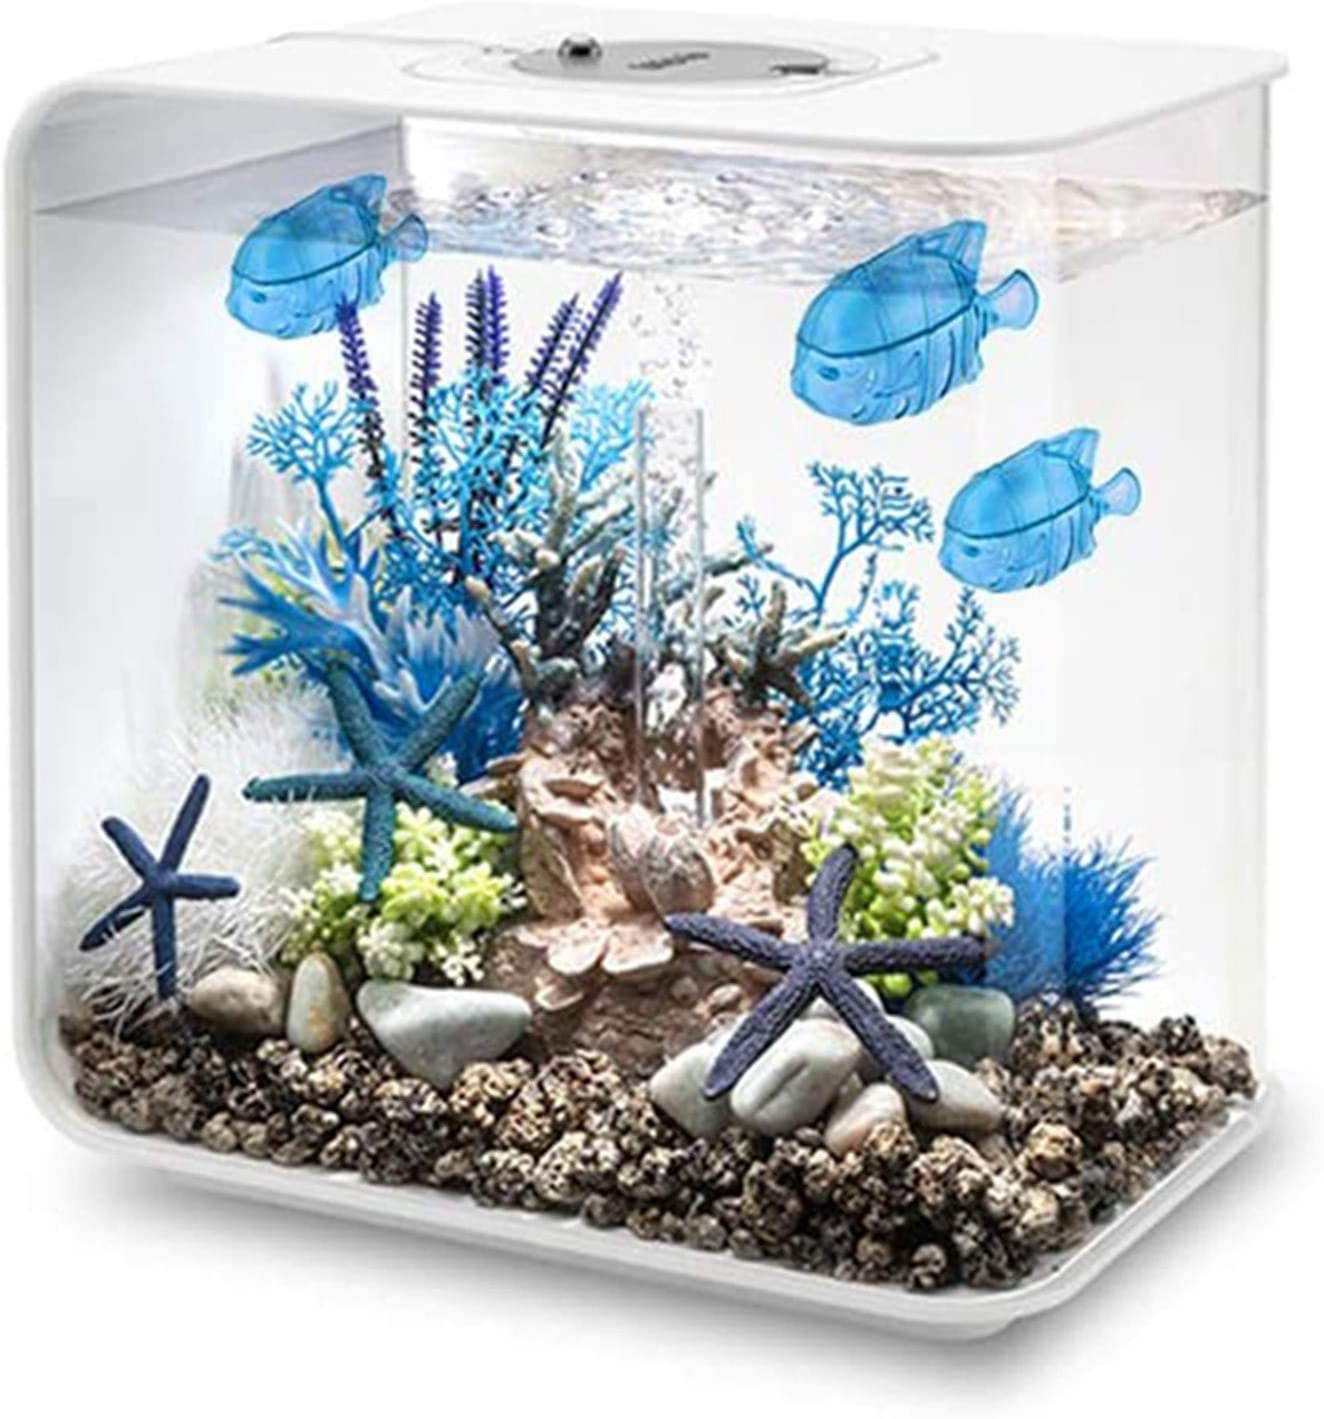 SUSOONFO10 개 범용 가습기 탱크 청소기 따뜻한 쿨 안개 가습기 물고기 탱크 호환 물고기 탱크(블루)